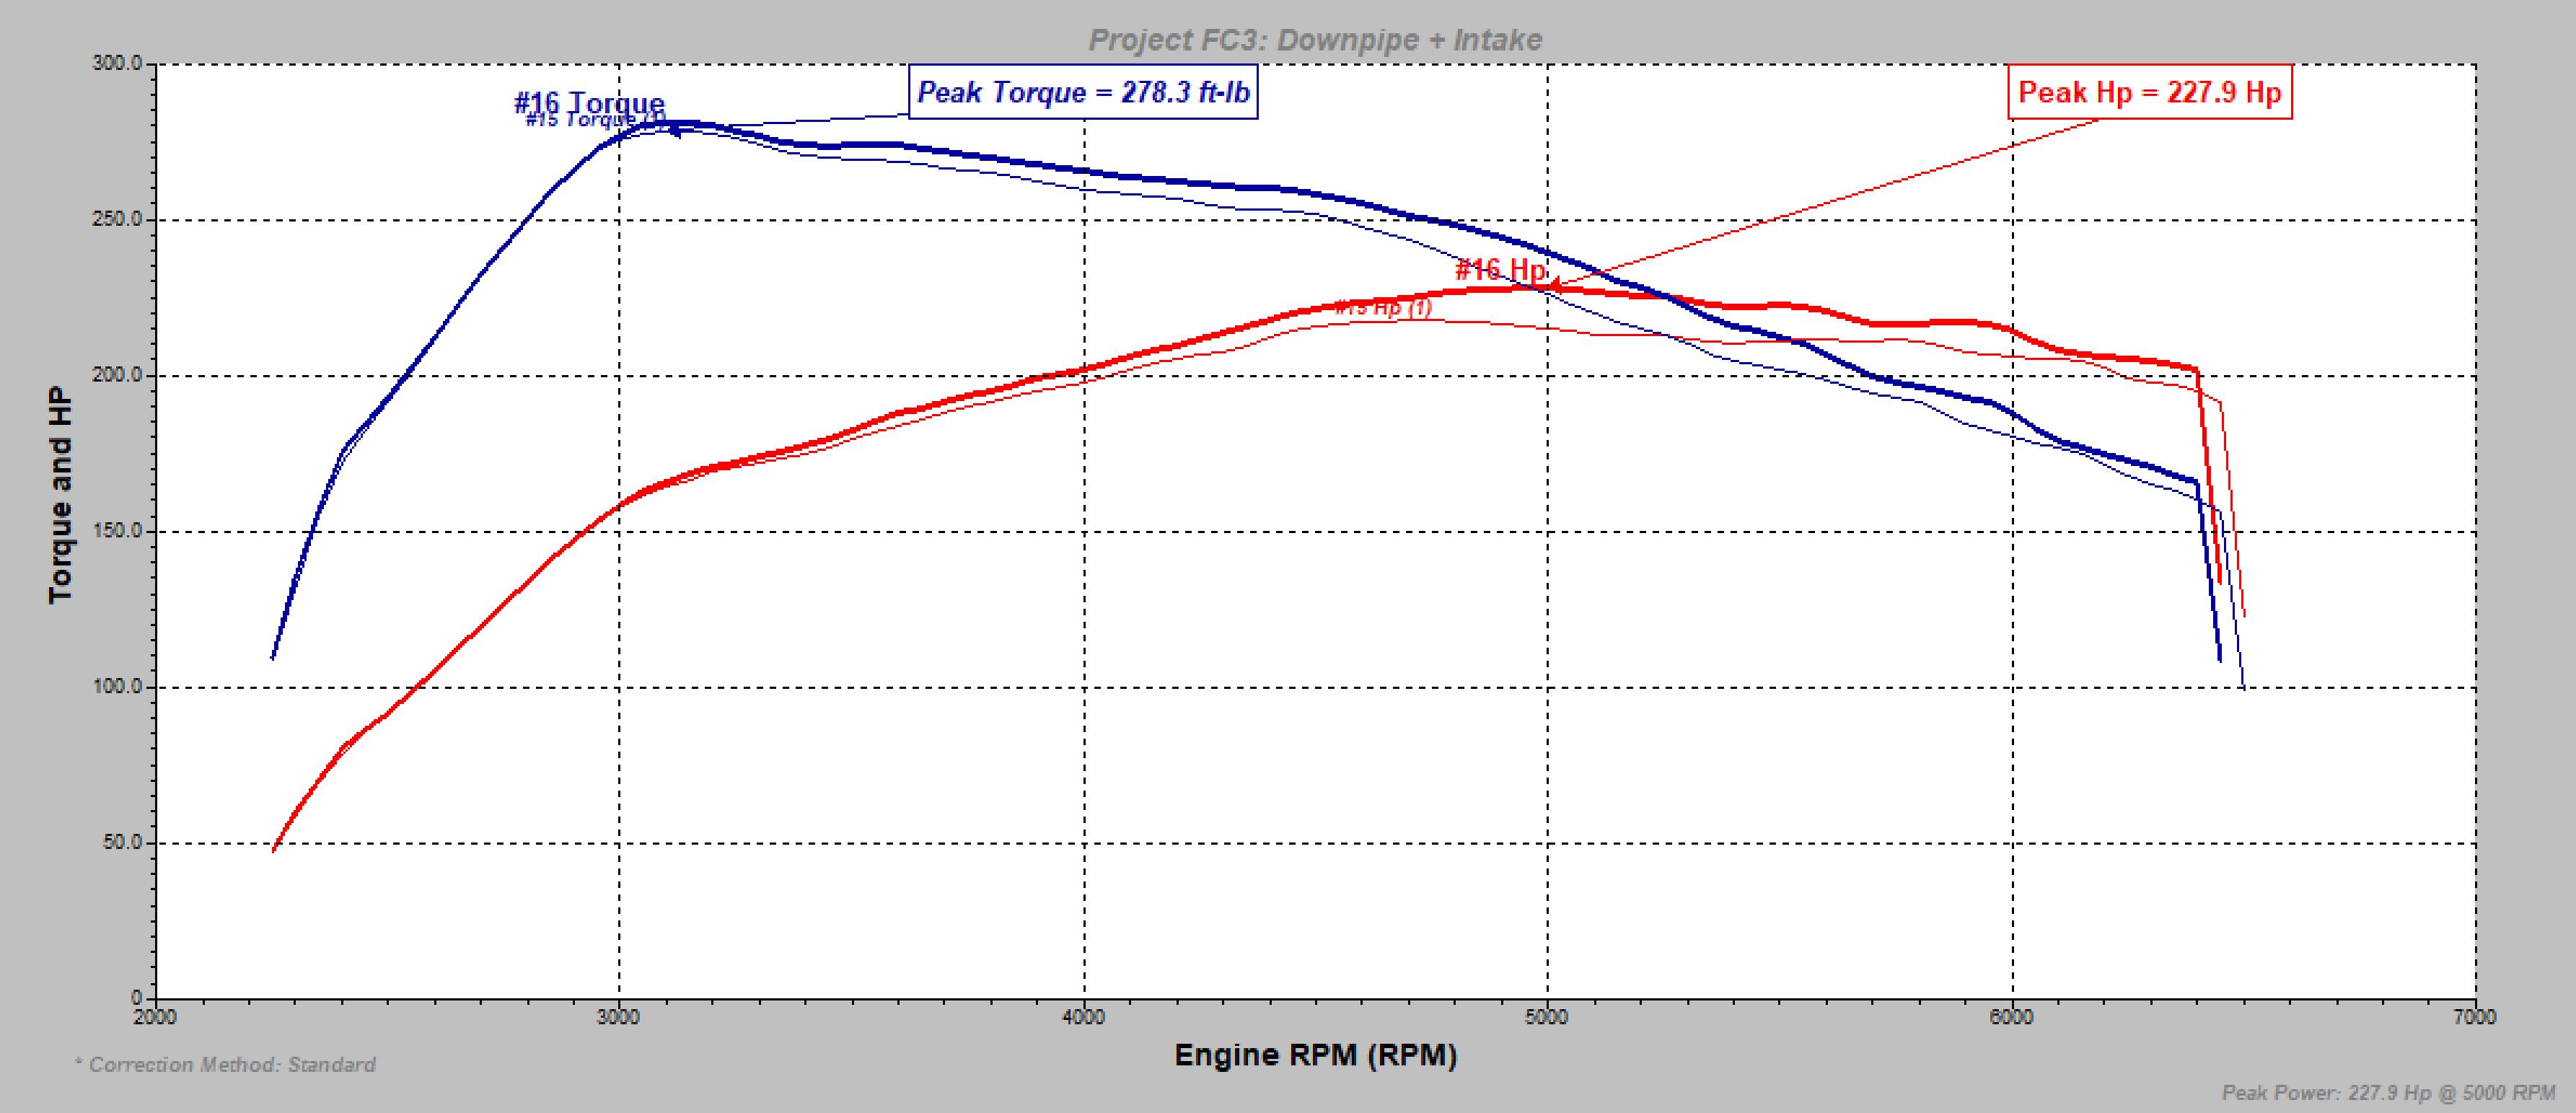 Intake vs DP